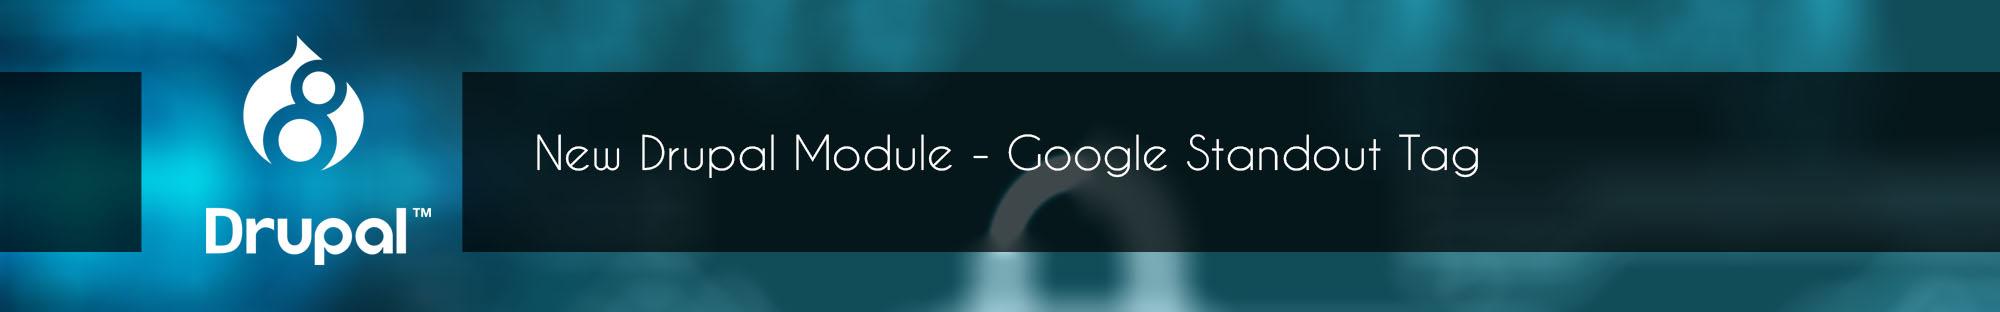 New Drupal Module - Google Standout Tag_Blog_0